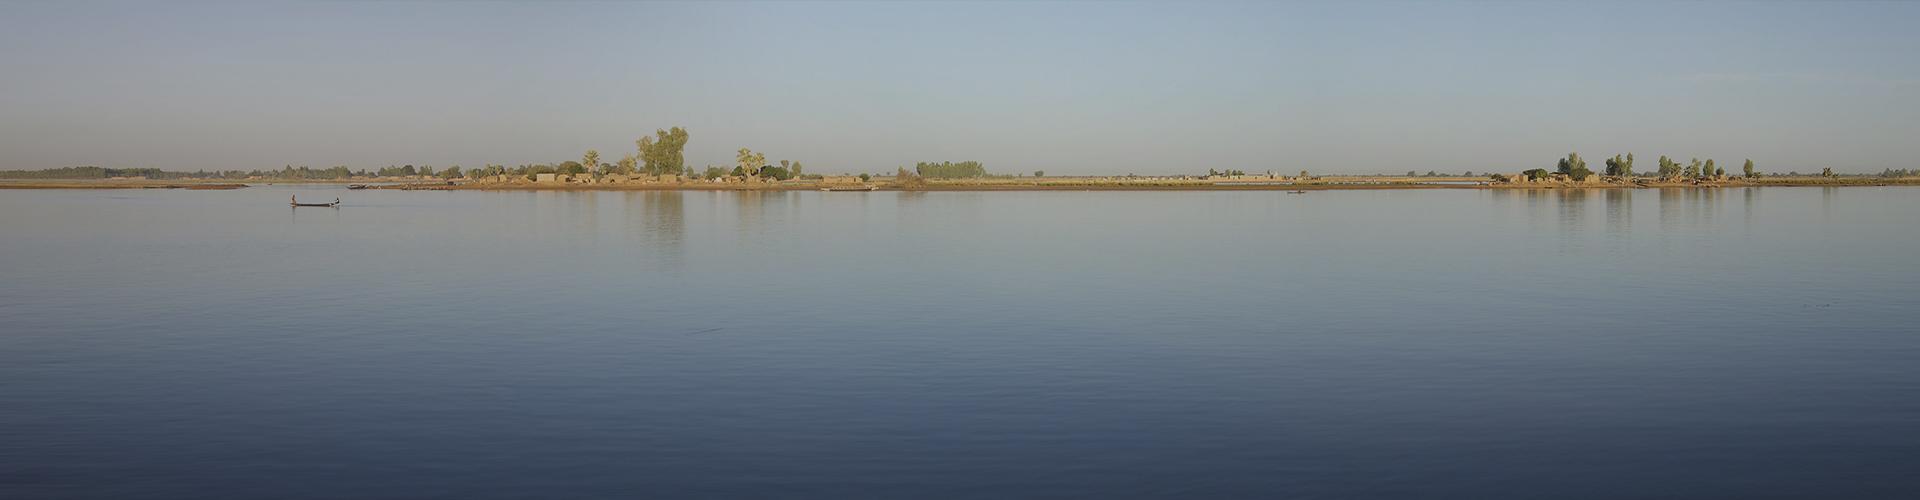 Landmark photograph of Mali